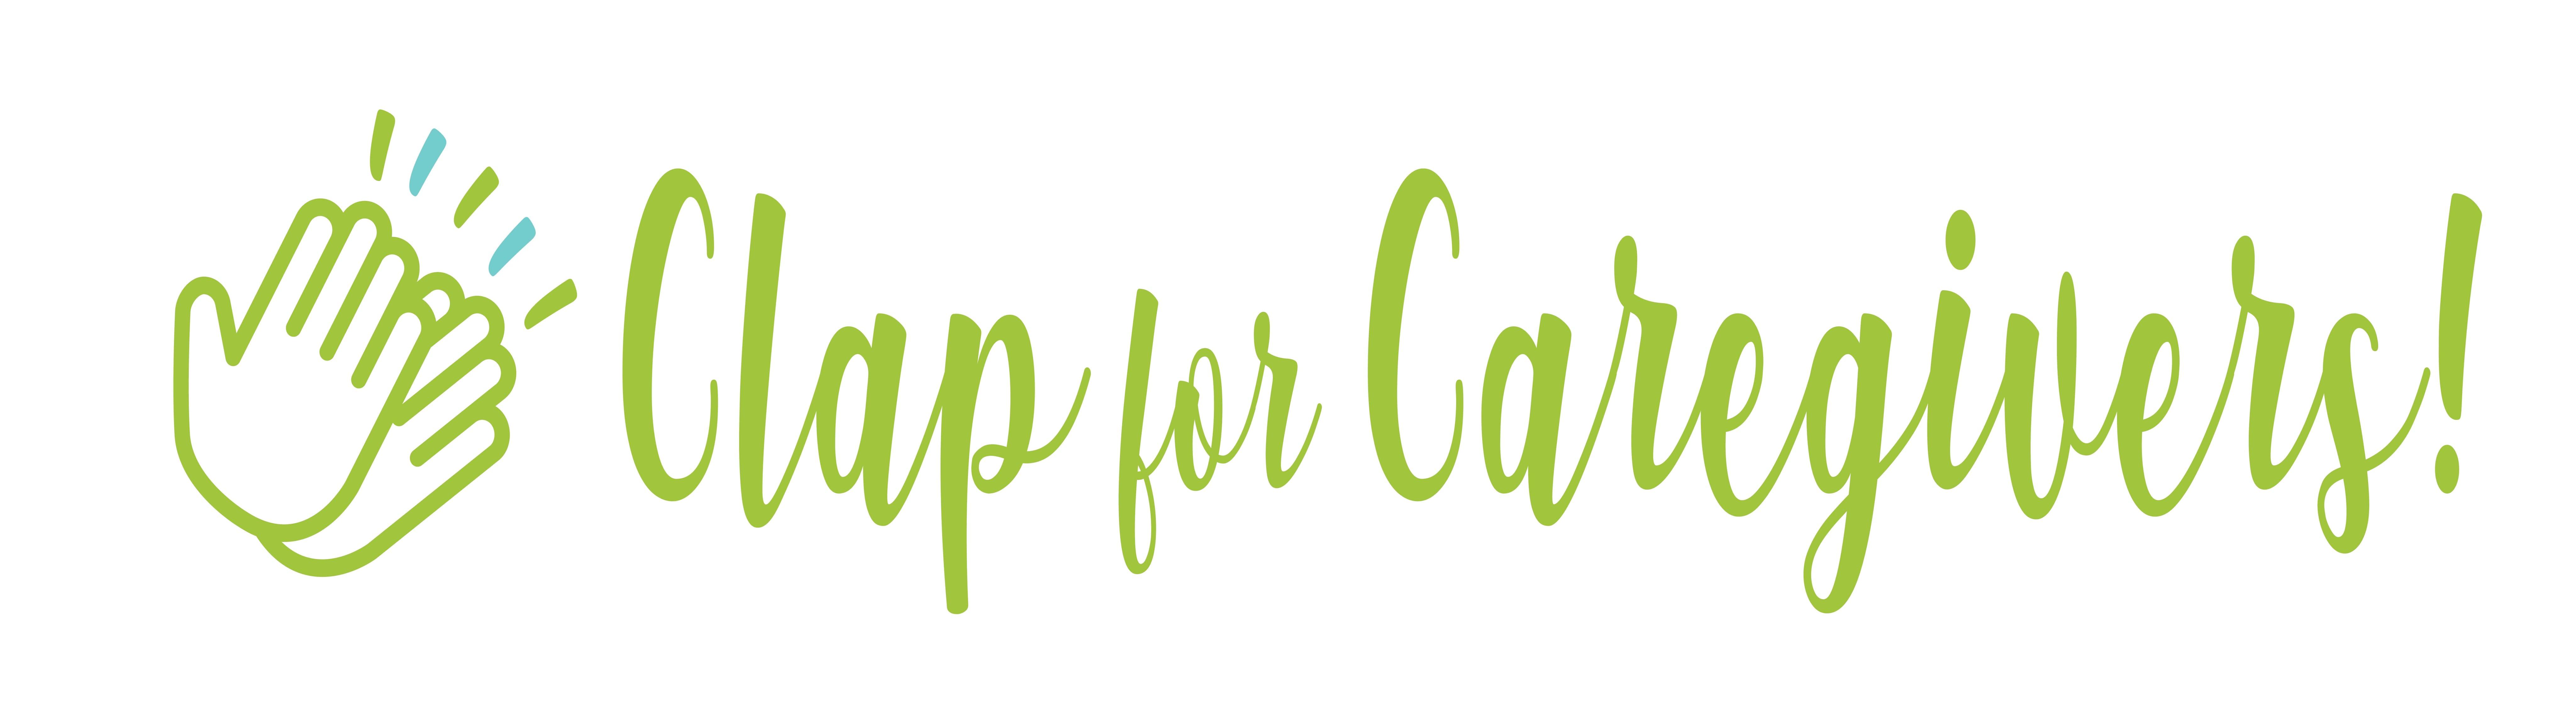 Clap for Caregivers